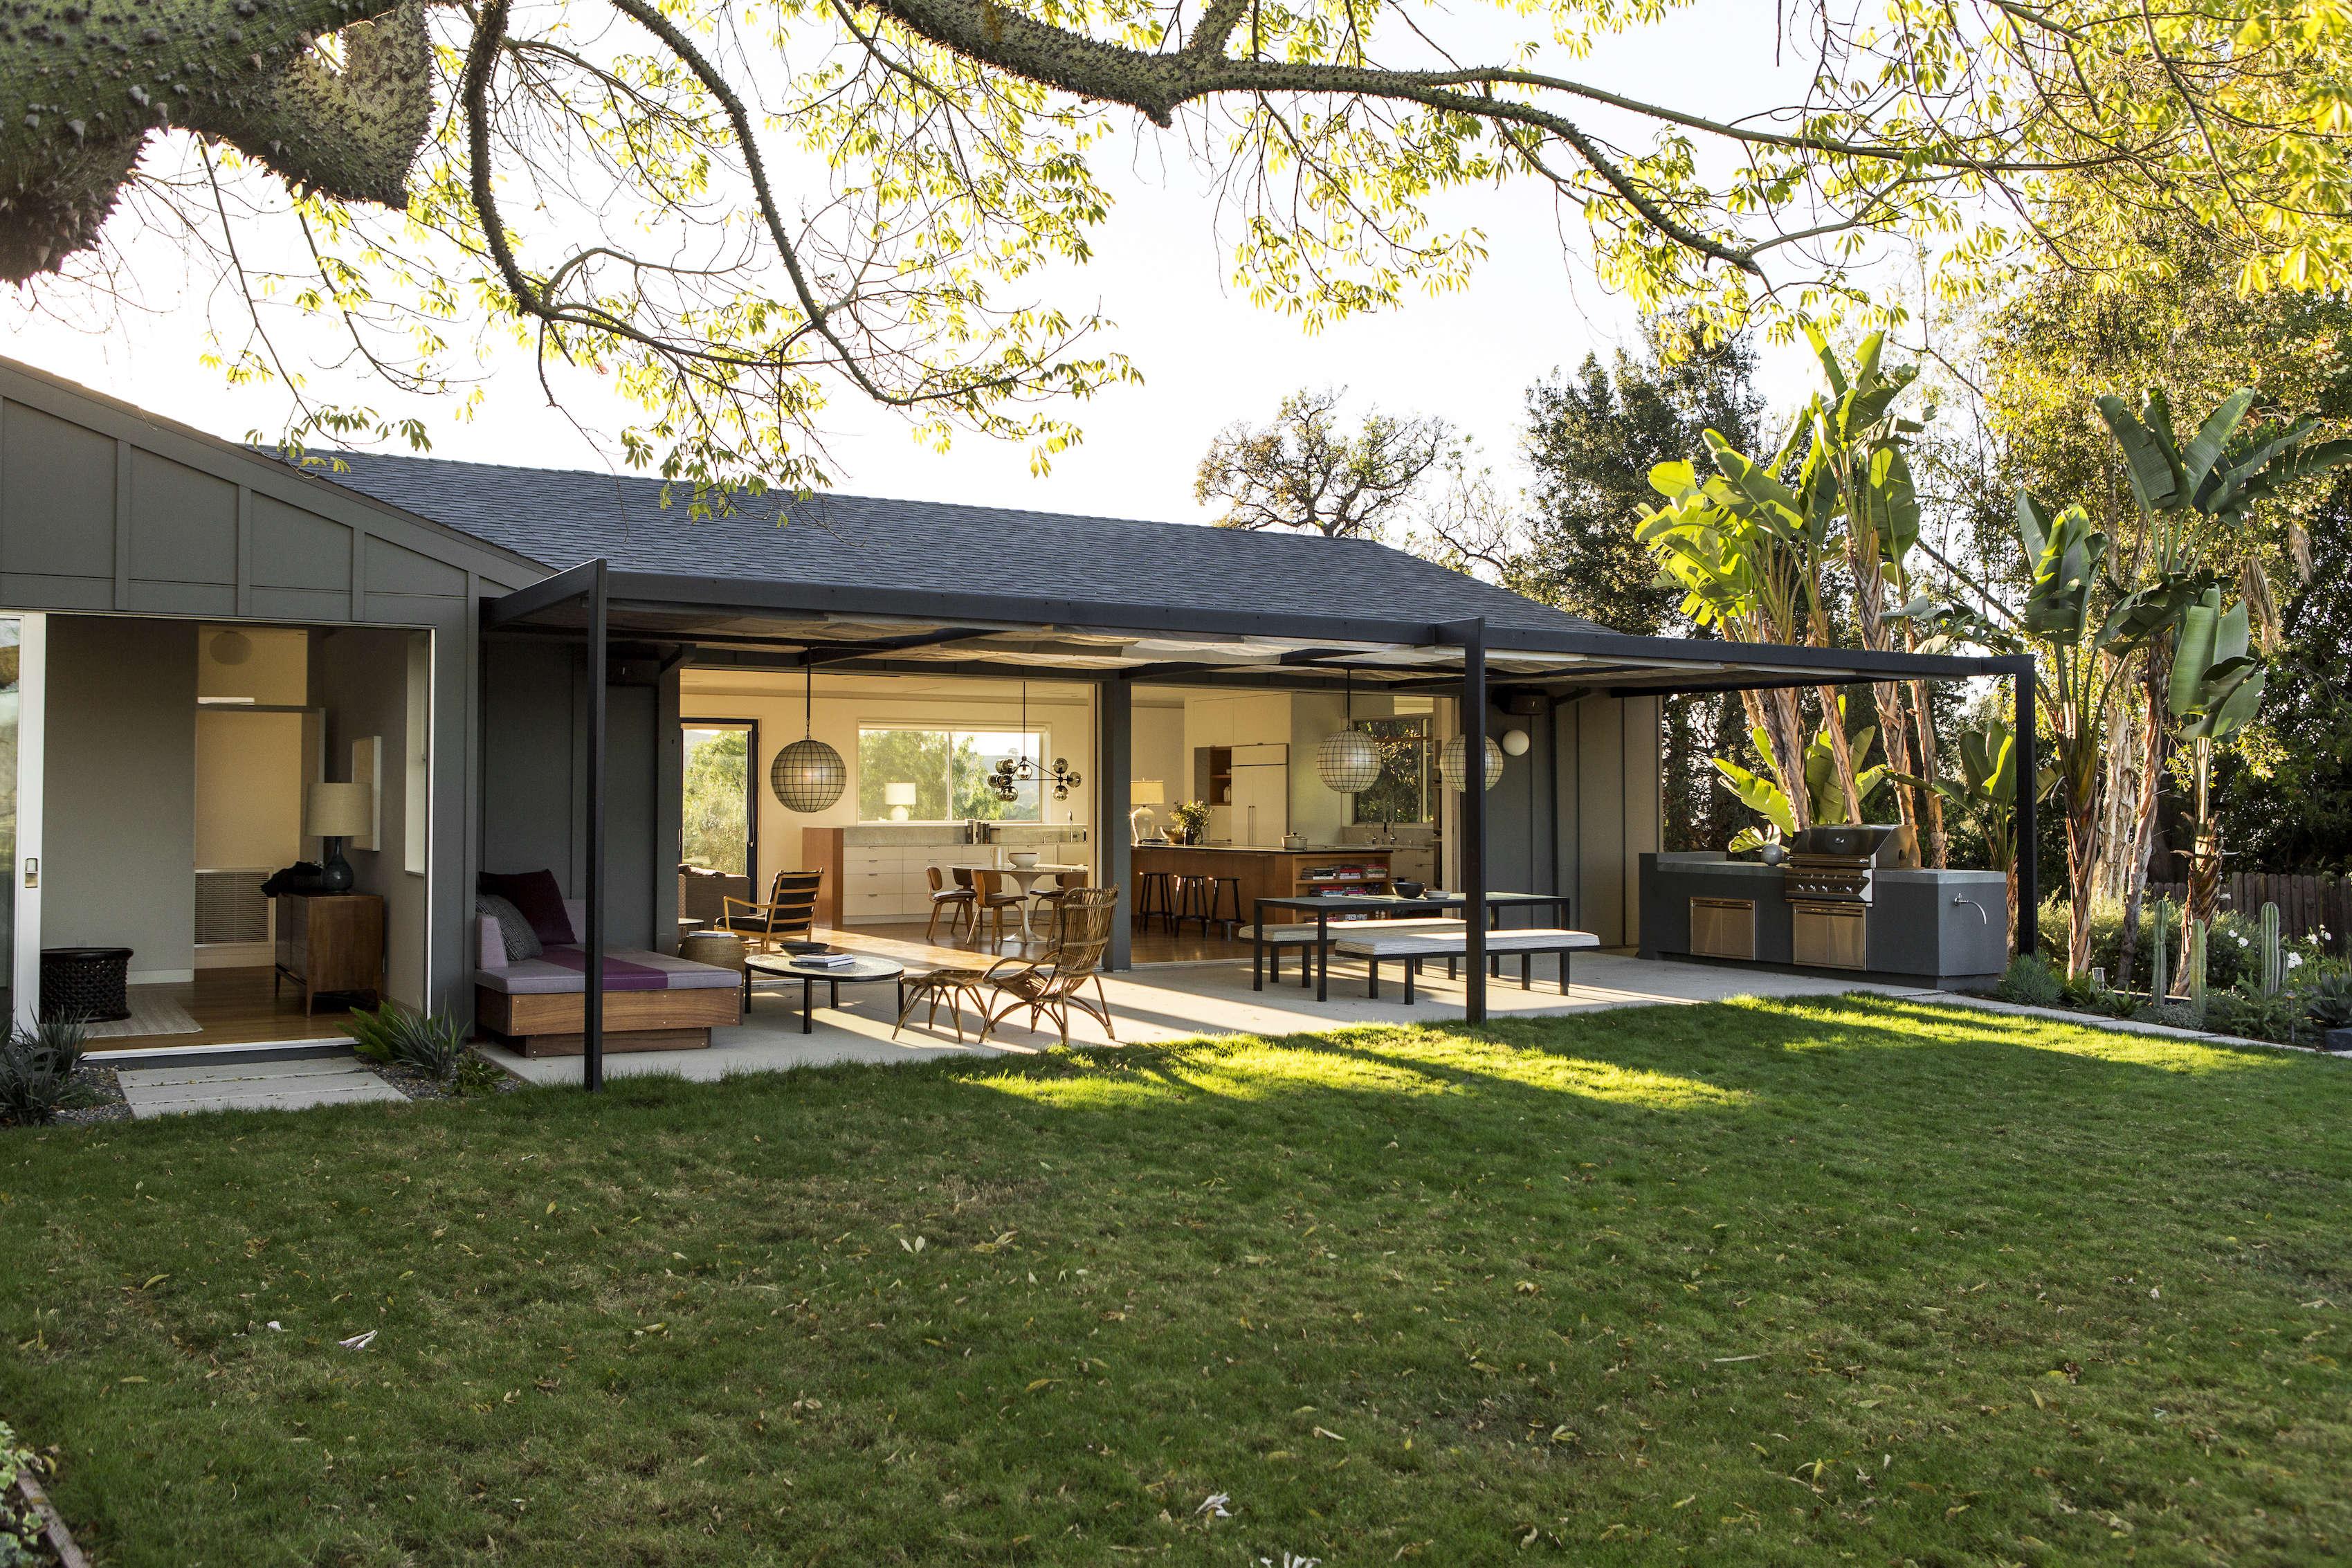 Indoor Outdoor Living An La Ranch Rehab By Barbara Bestor